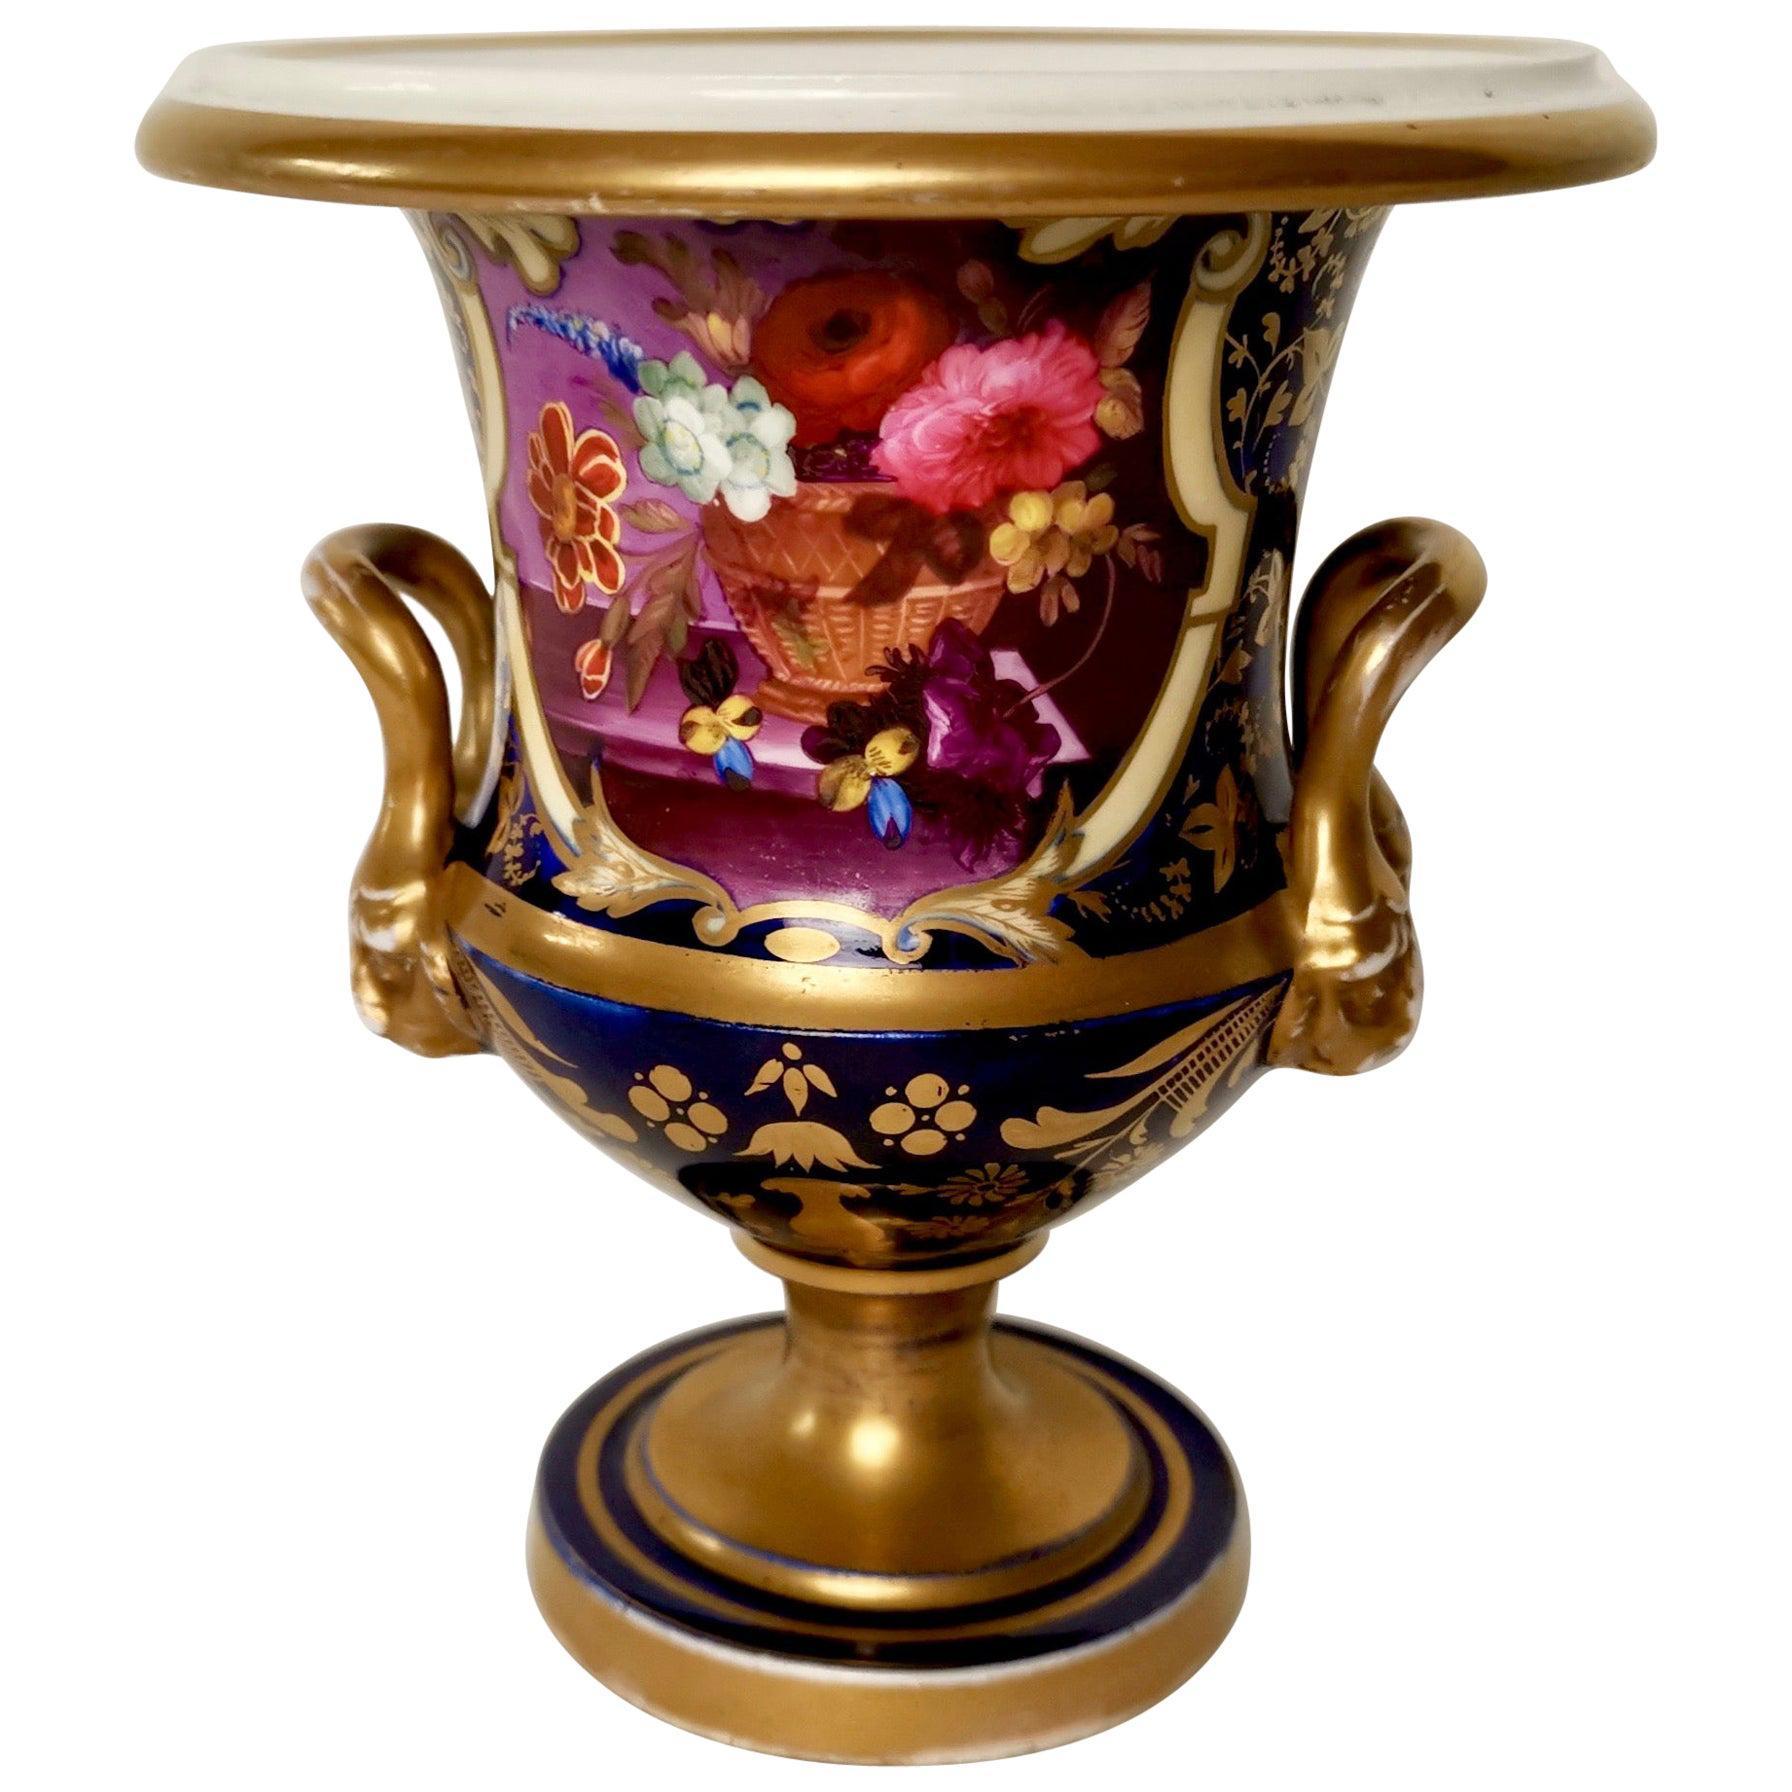 Herculaneum Porcelain Vase, Purple, Flowers Lion Head Handles Regency circa 1820